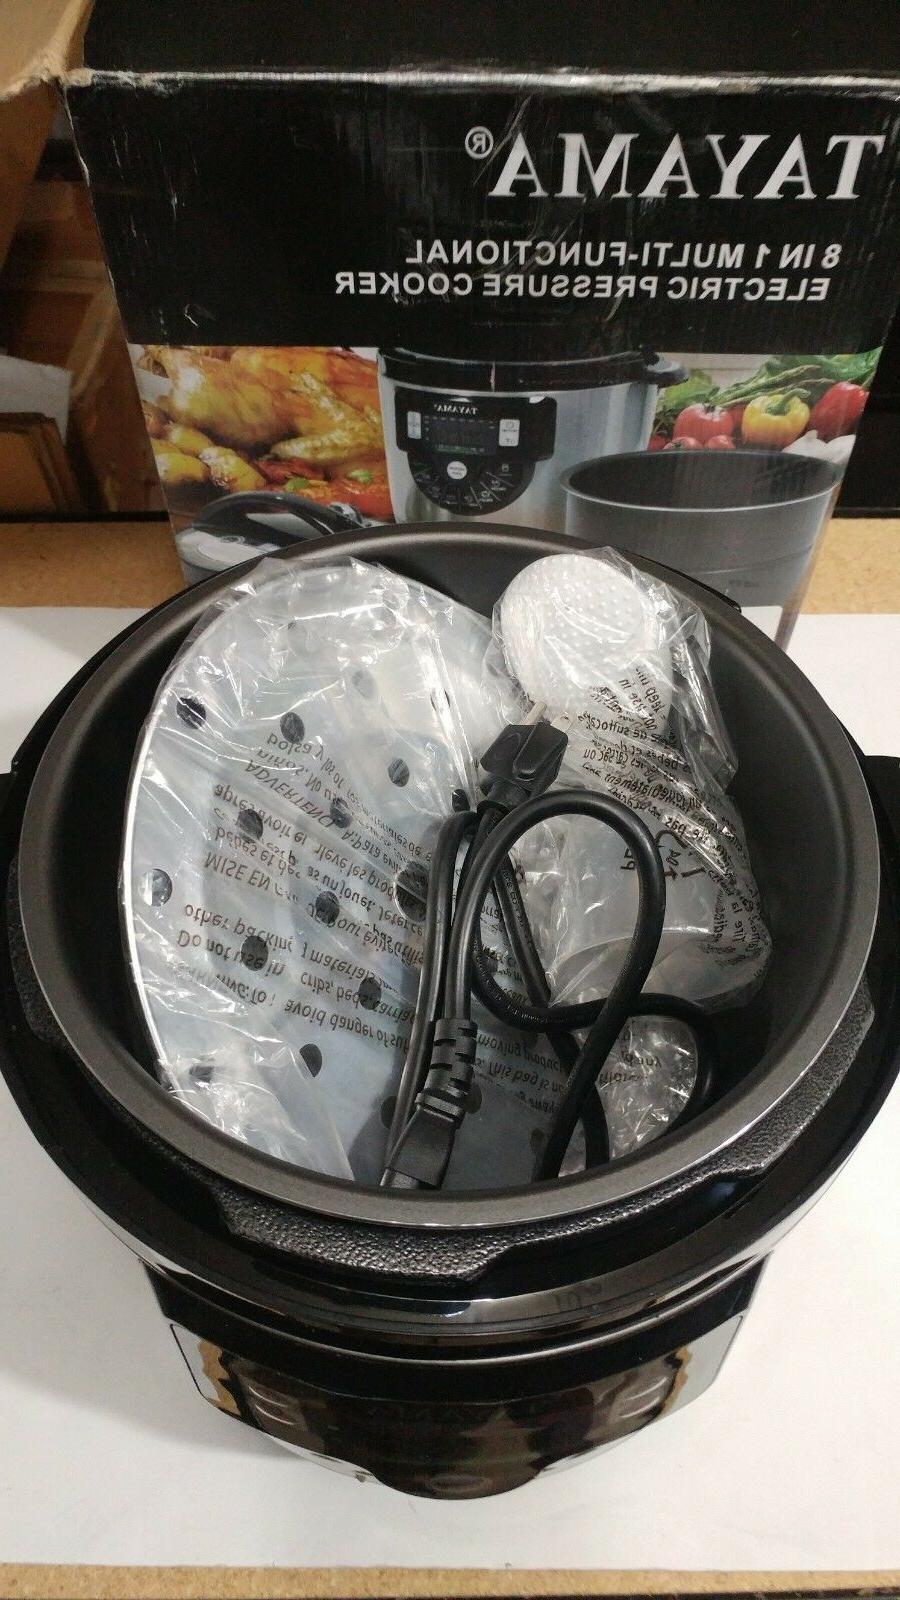 Tayama 8 in Function Pressure Cooker, Qt, Black